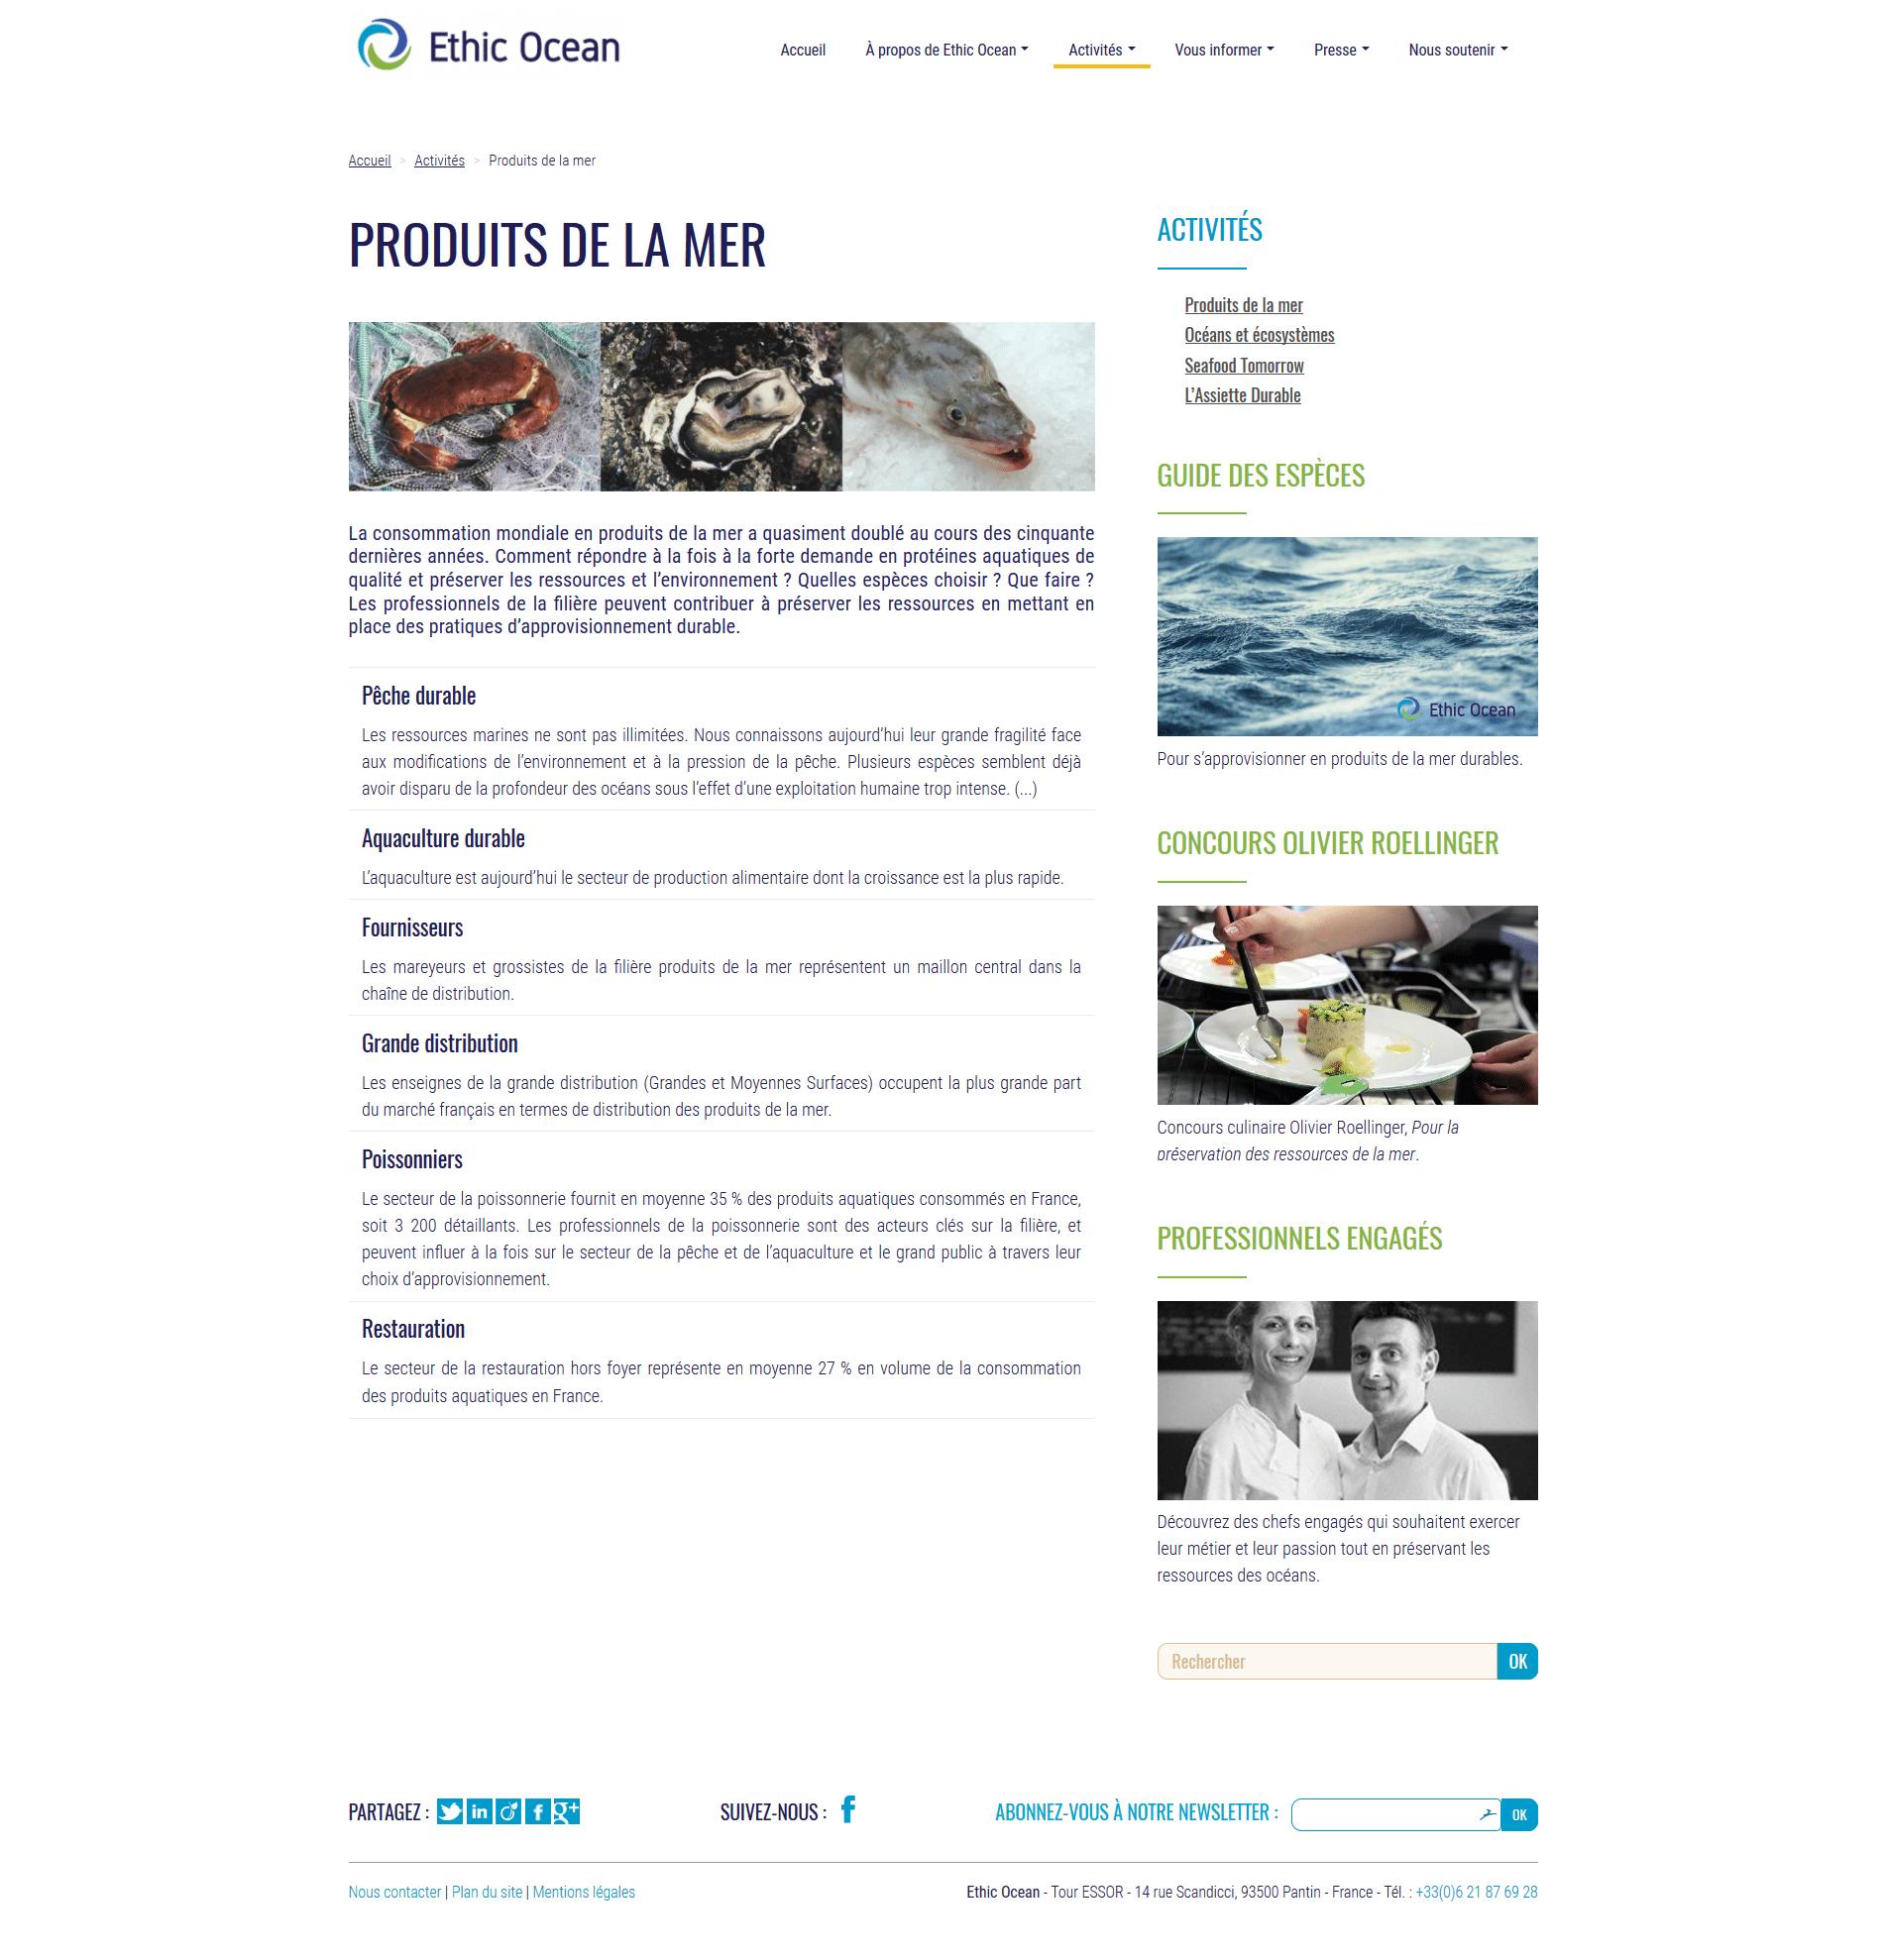 Ancienne version spip du site Ethic Ocean